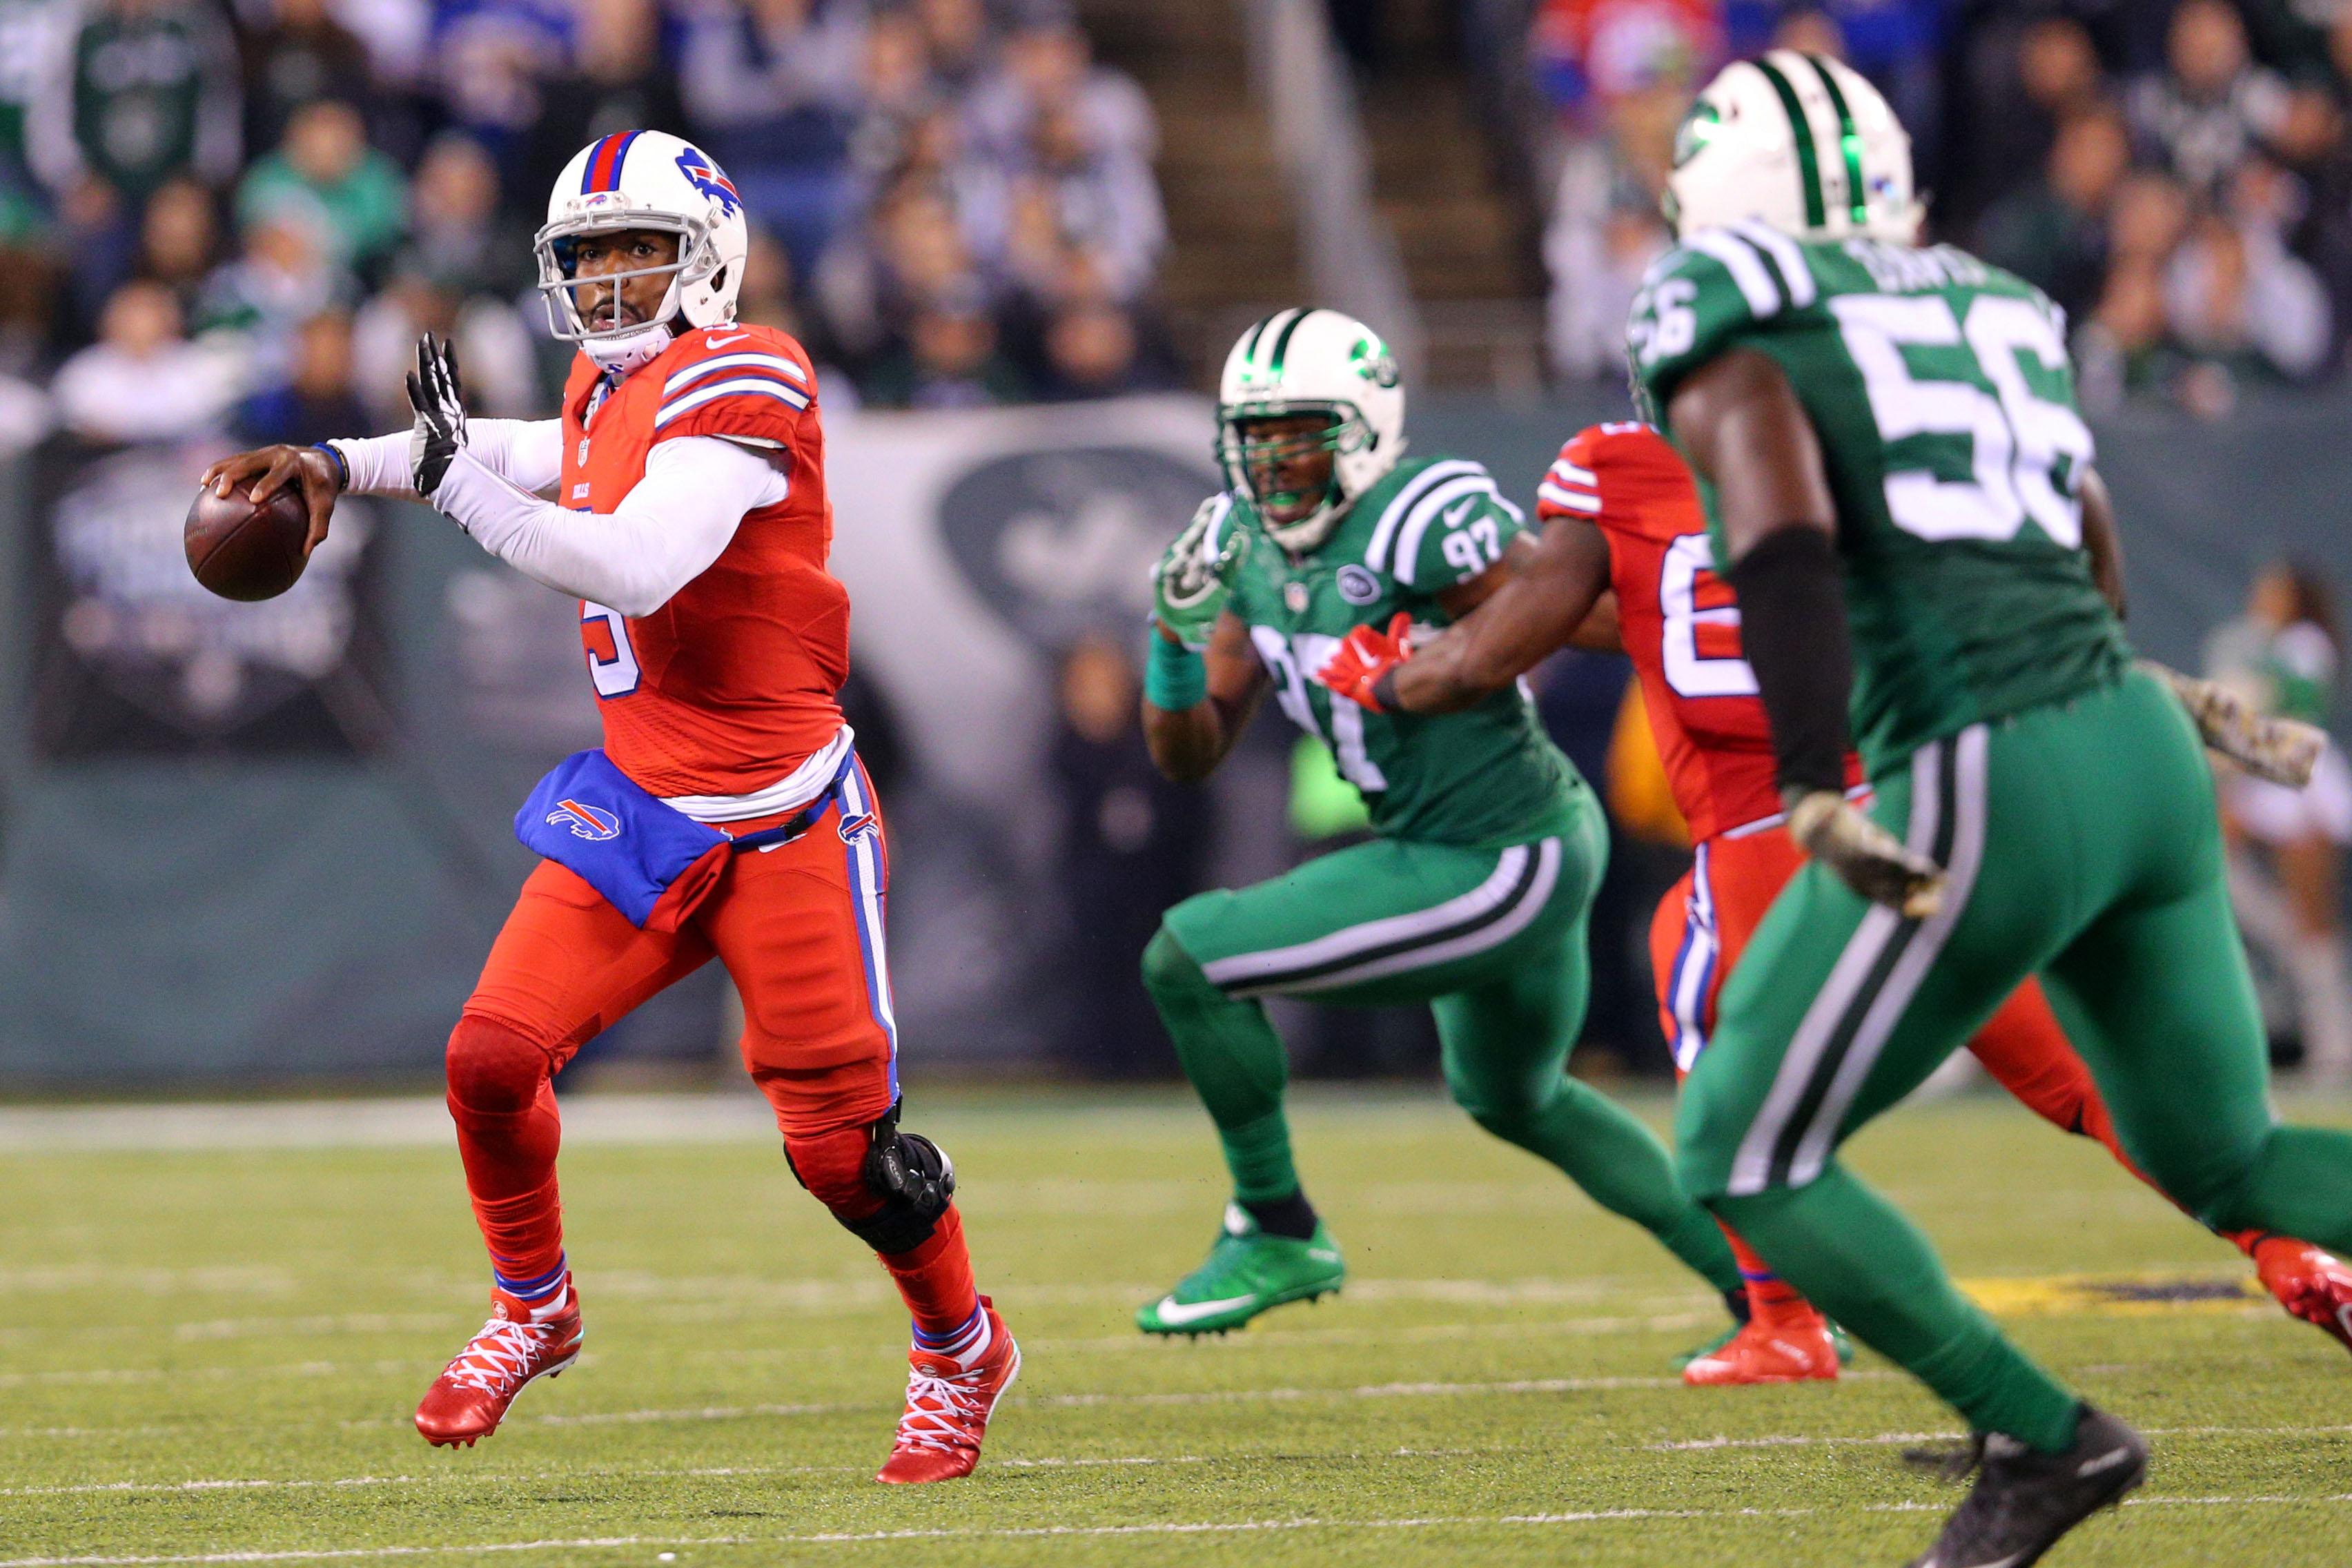 Bills vs. Jets 2015 final score: Buffalo holds on for 22-17 victory